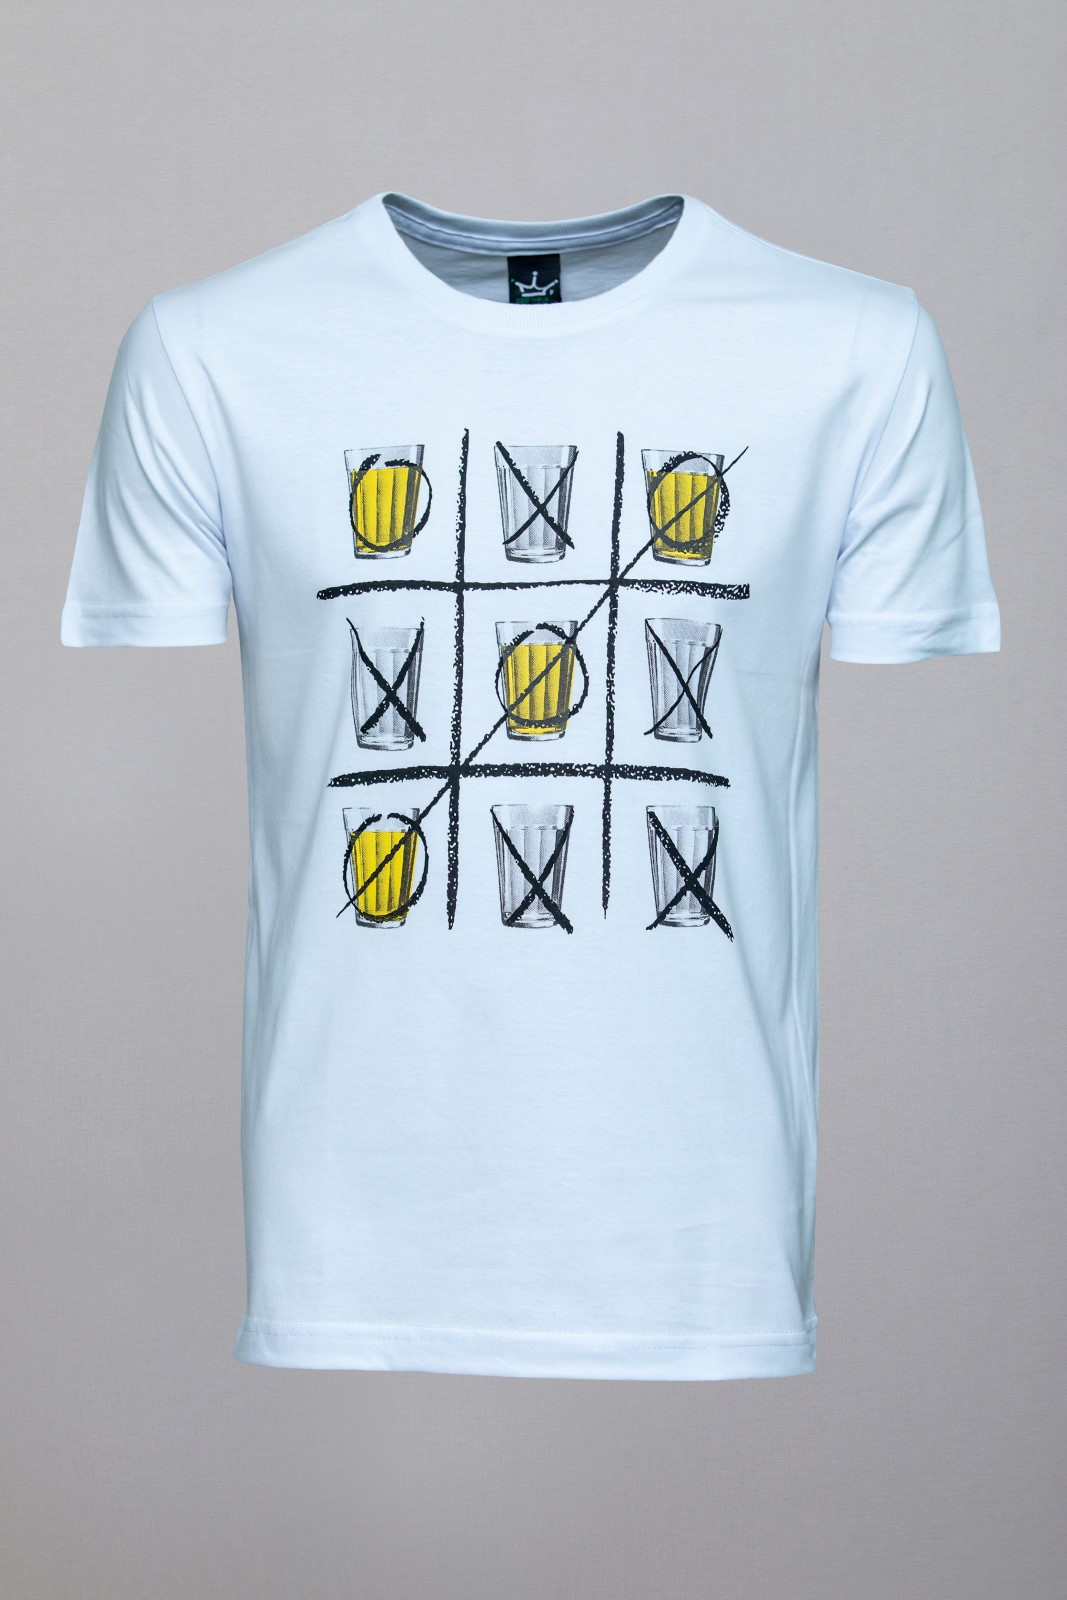 Camiseta CoolWave Tic Tac Toe Game